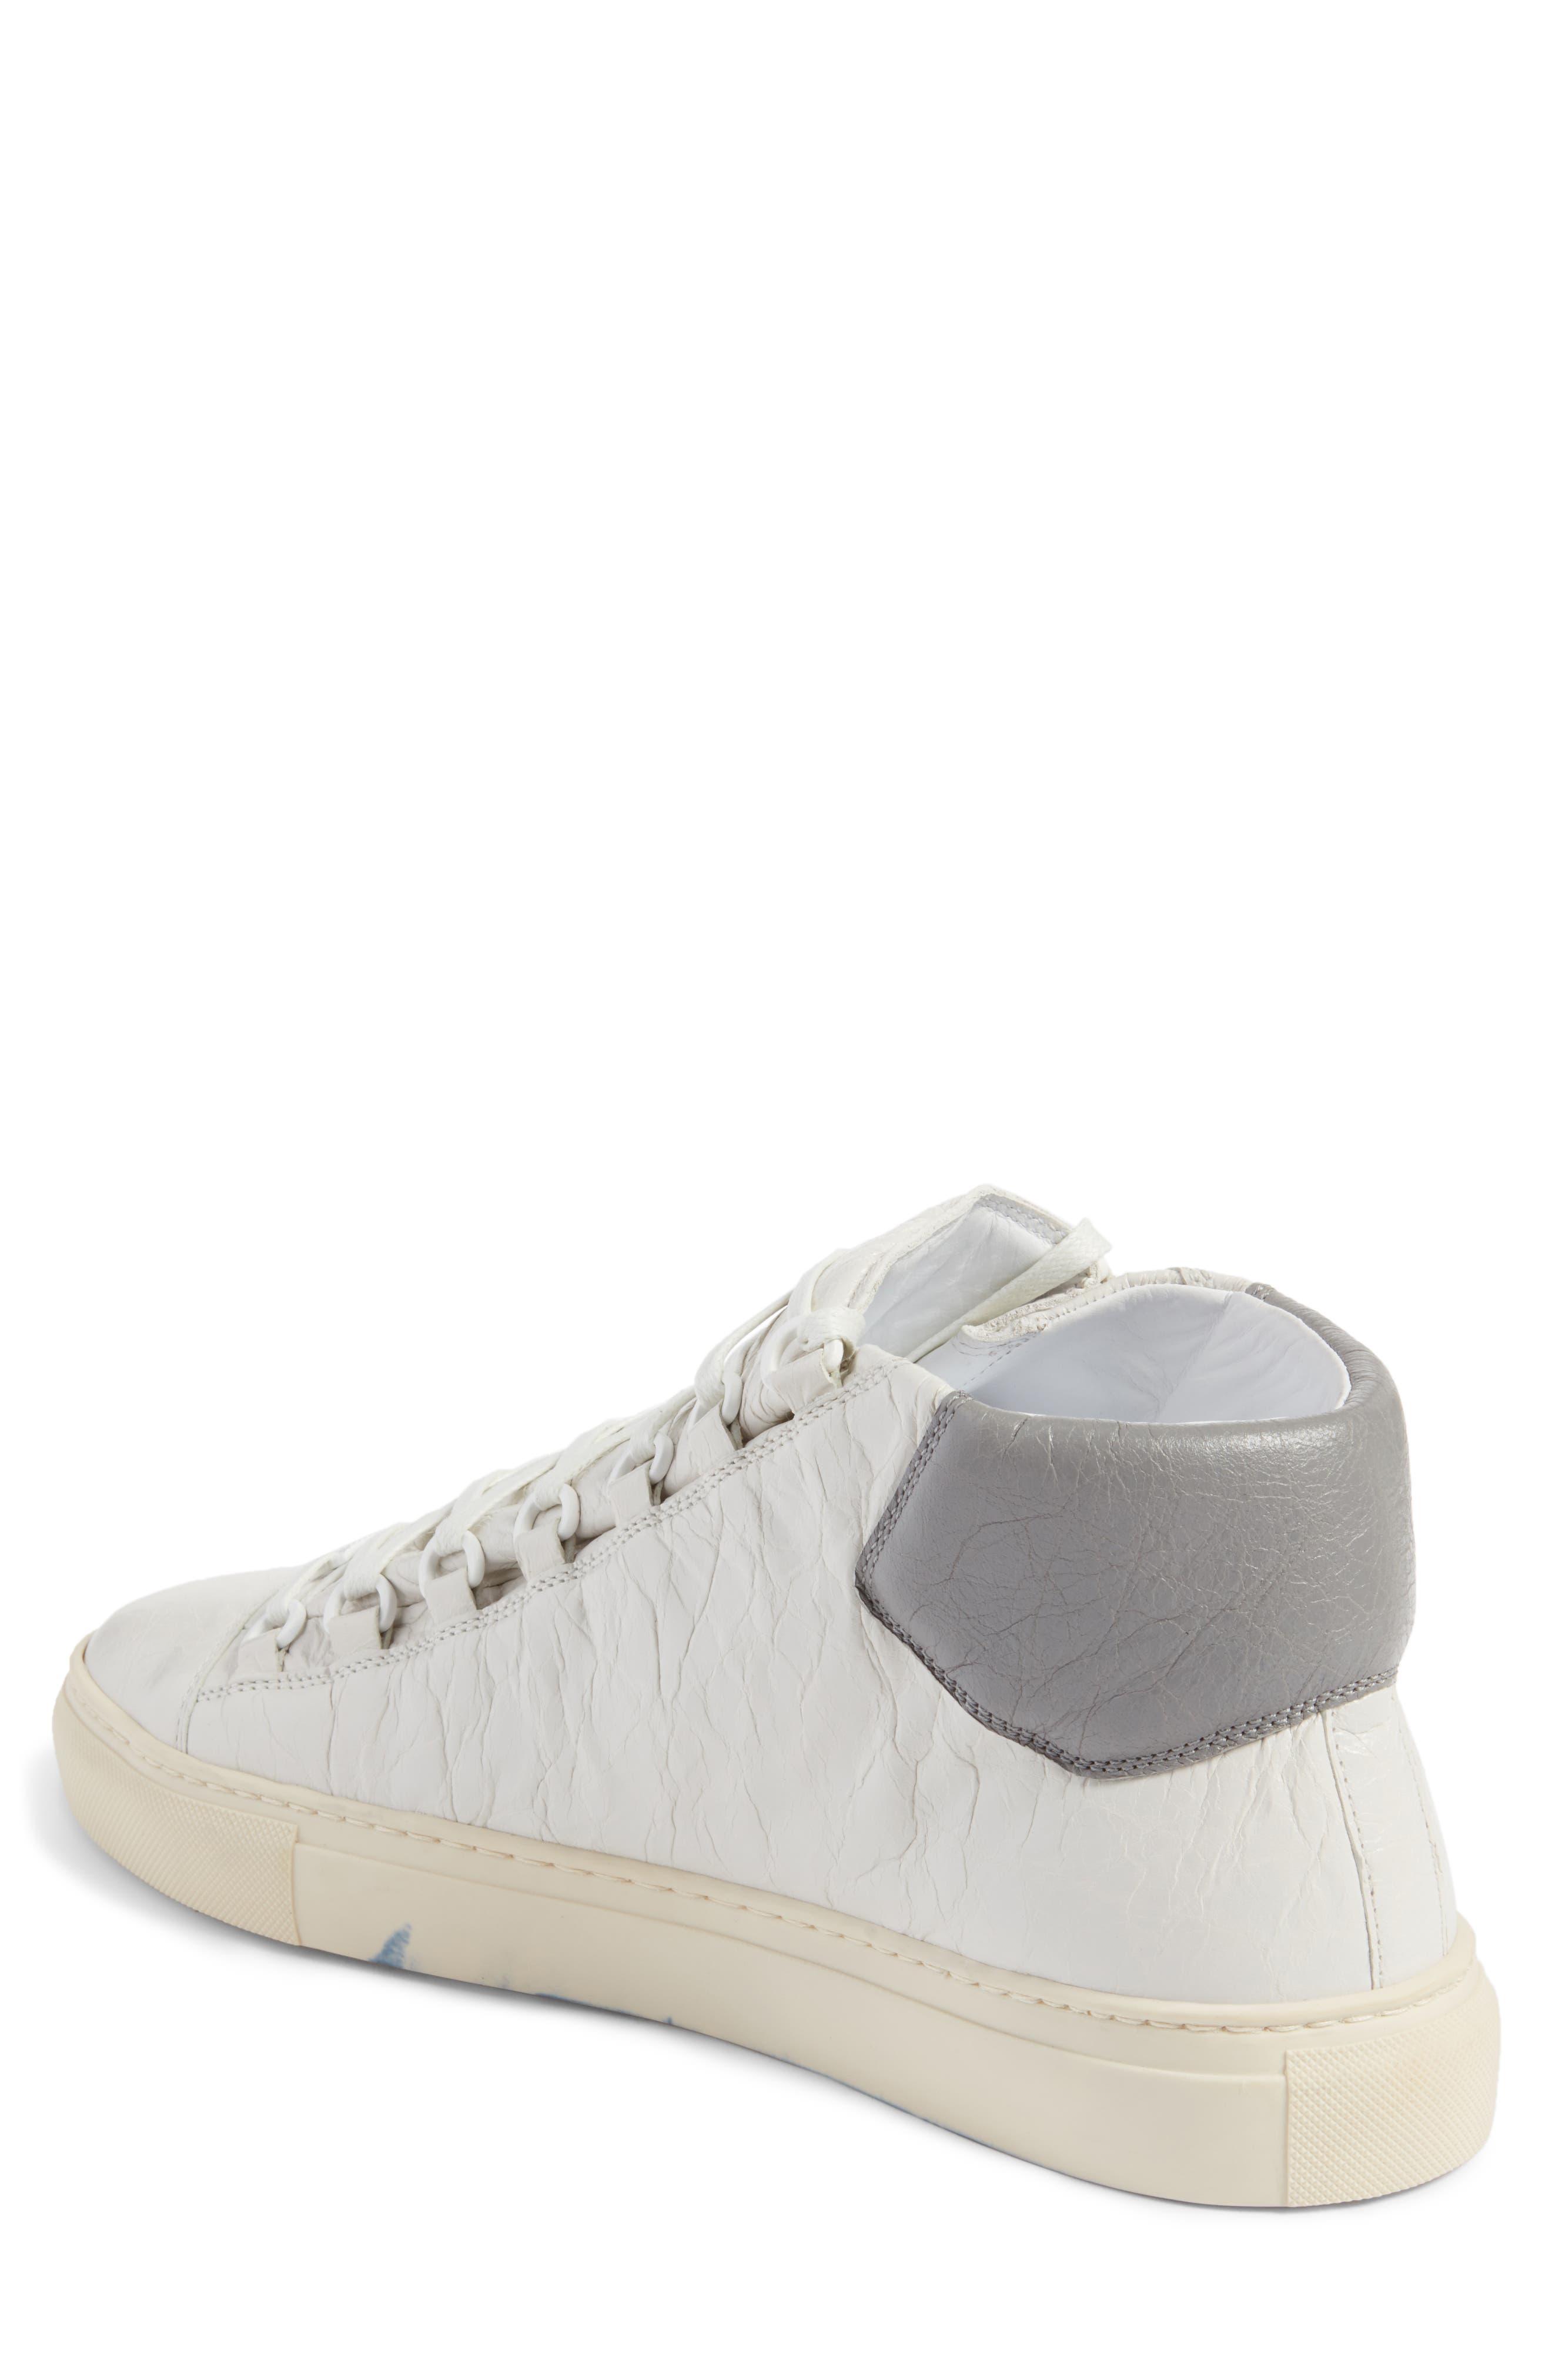 Arena High Sneaker,                             Alternate thumbnail 2, color,                             167